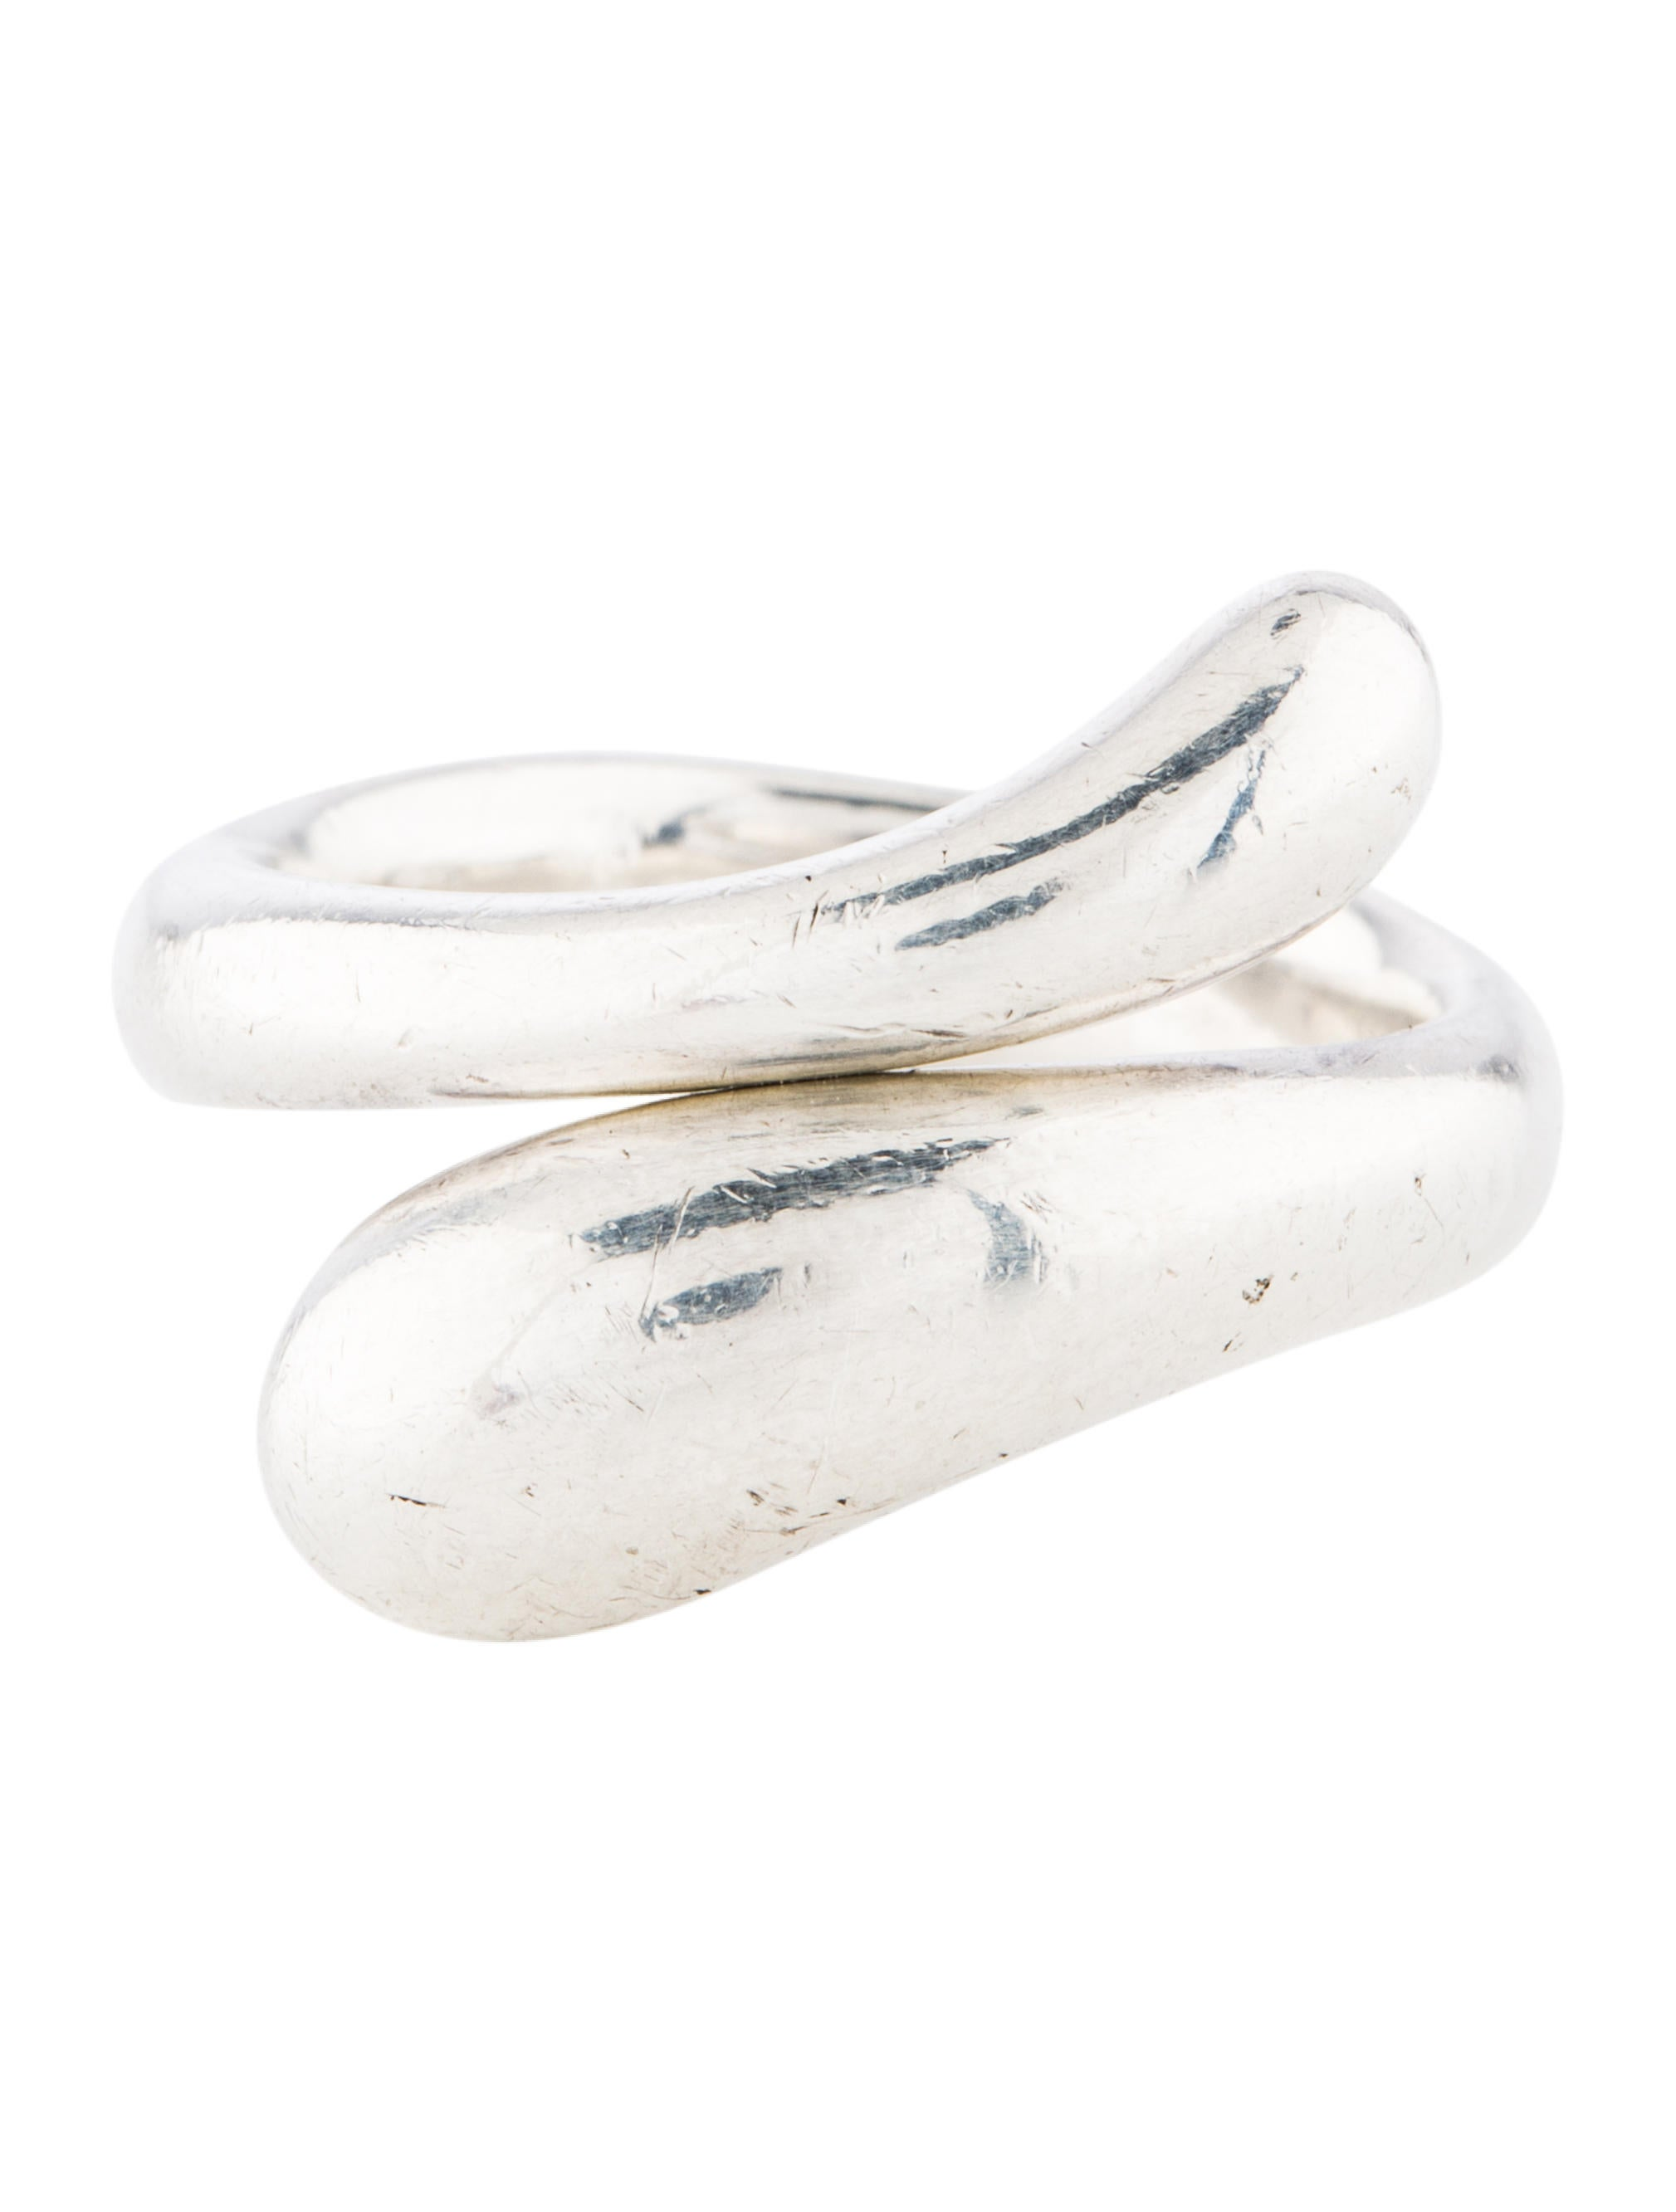 Tiffany Amp Co Teardrop Ring Rings Tif77789 The Realreal